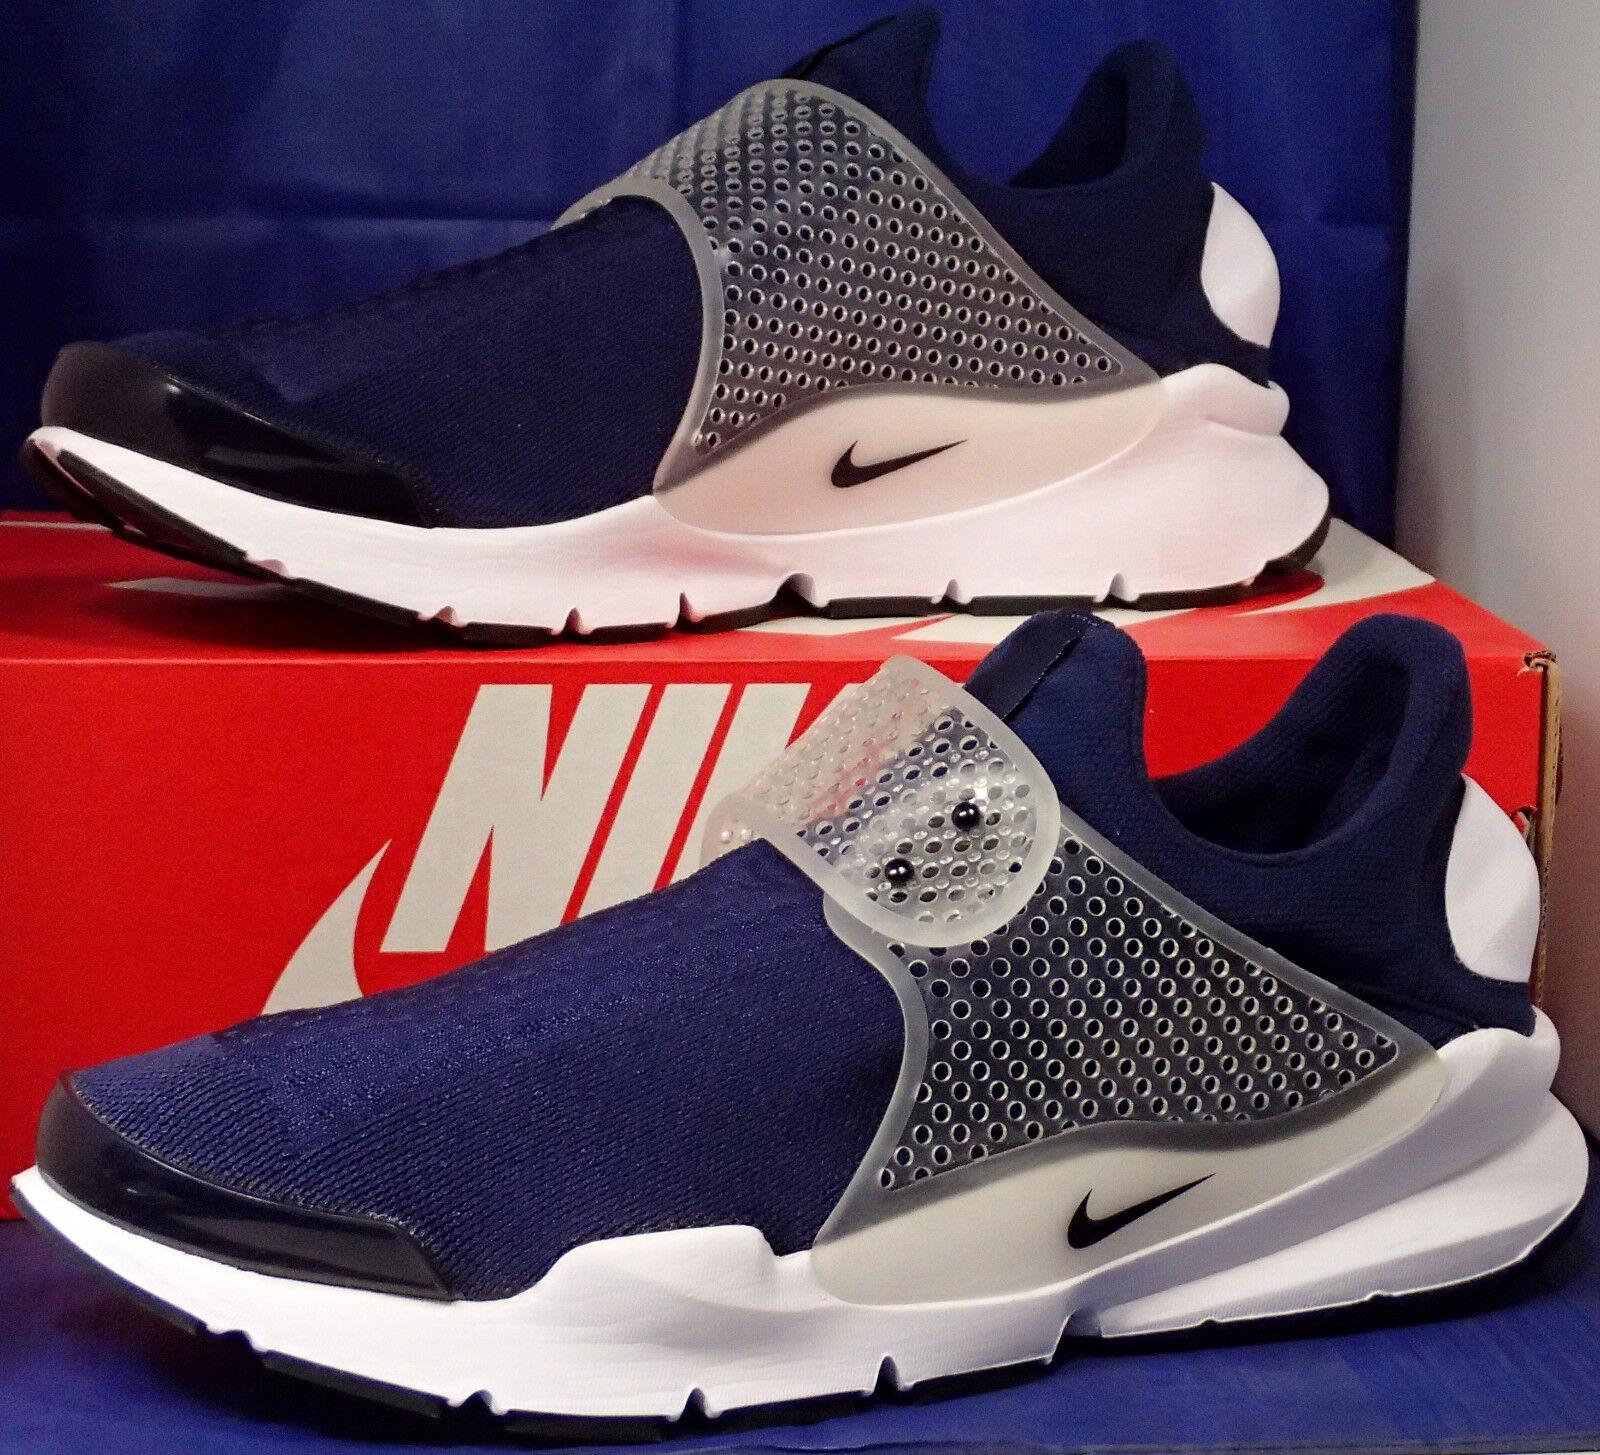 Nike sock dardo mezzanotte blu scuro, bianco nero sz 12 (819686-400)